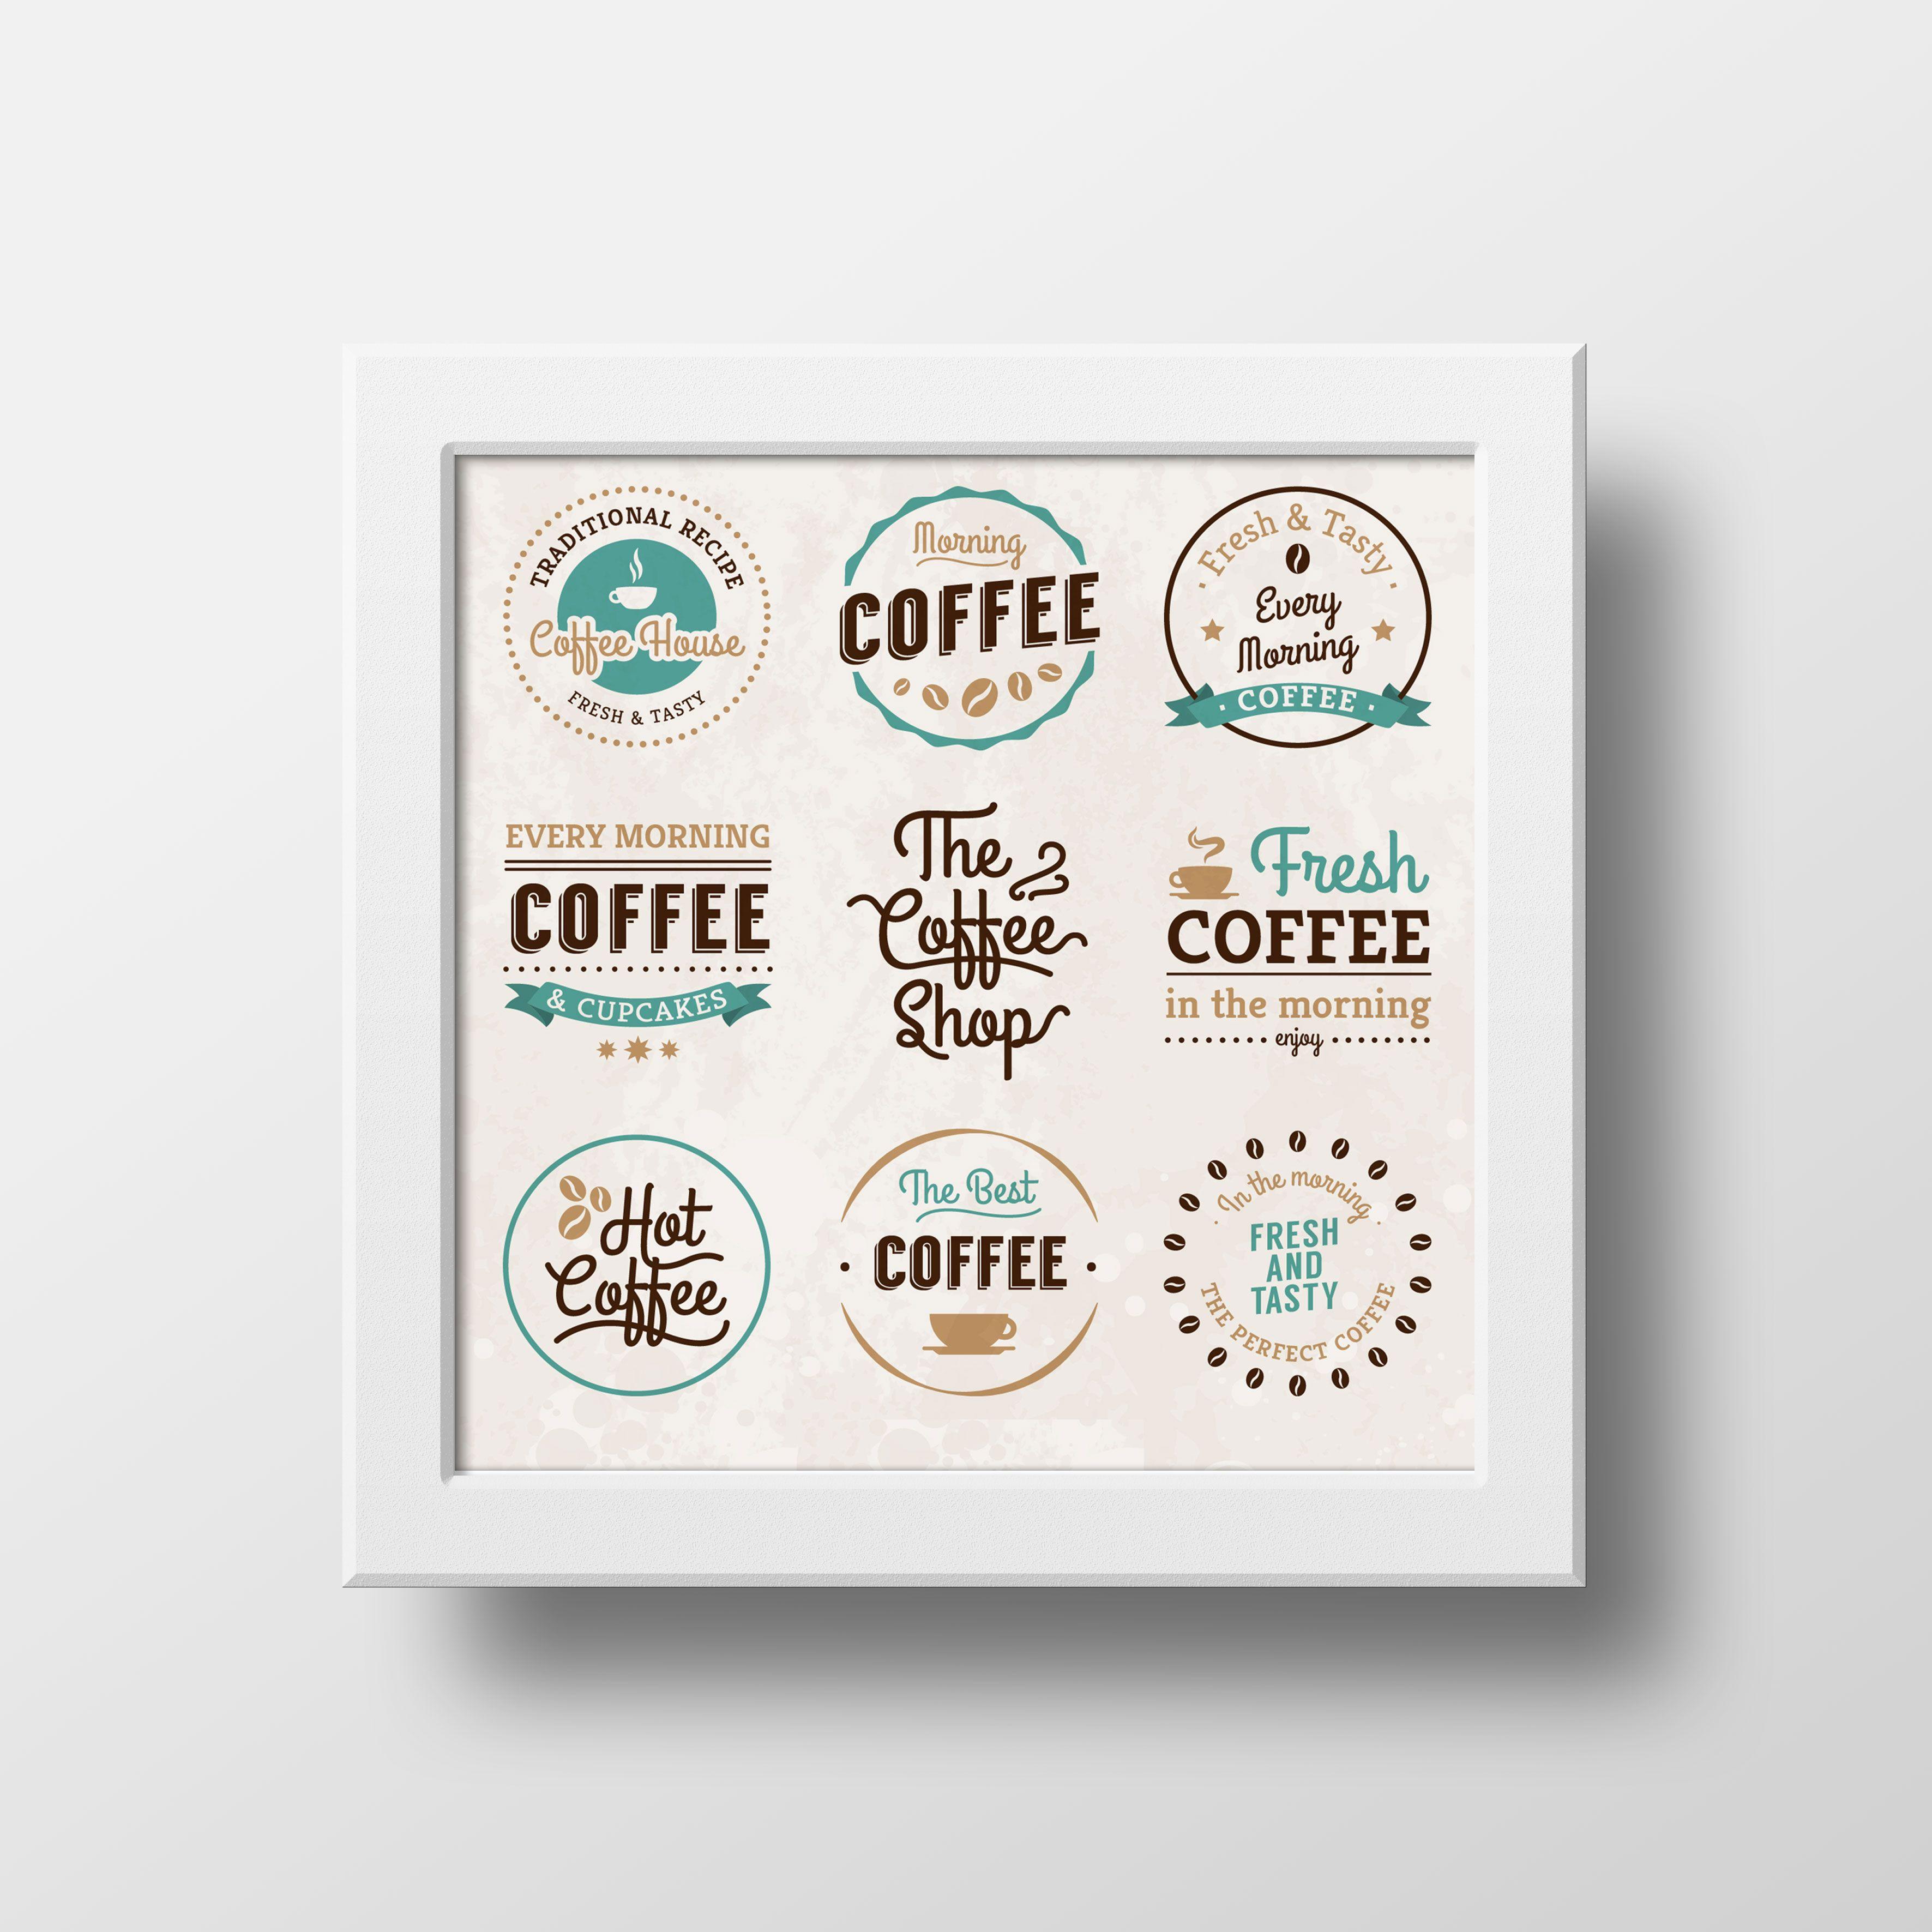 081 946 542 871 Poster Cafe Vintage Poster Cafe Retro Poster Hiasan Dinding Cafe Poster Dinding Hiasan